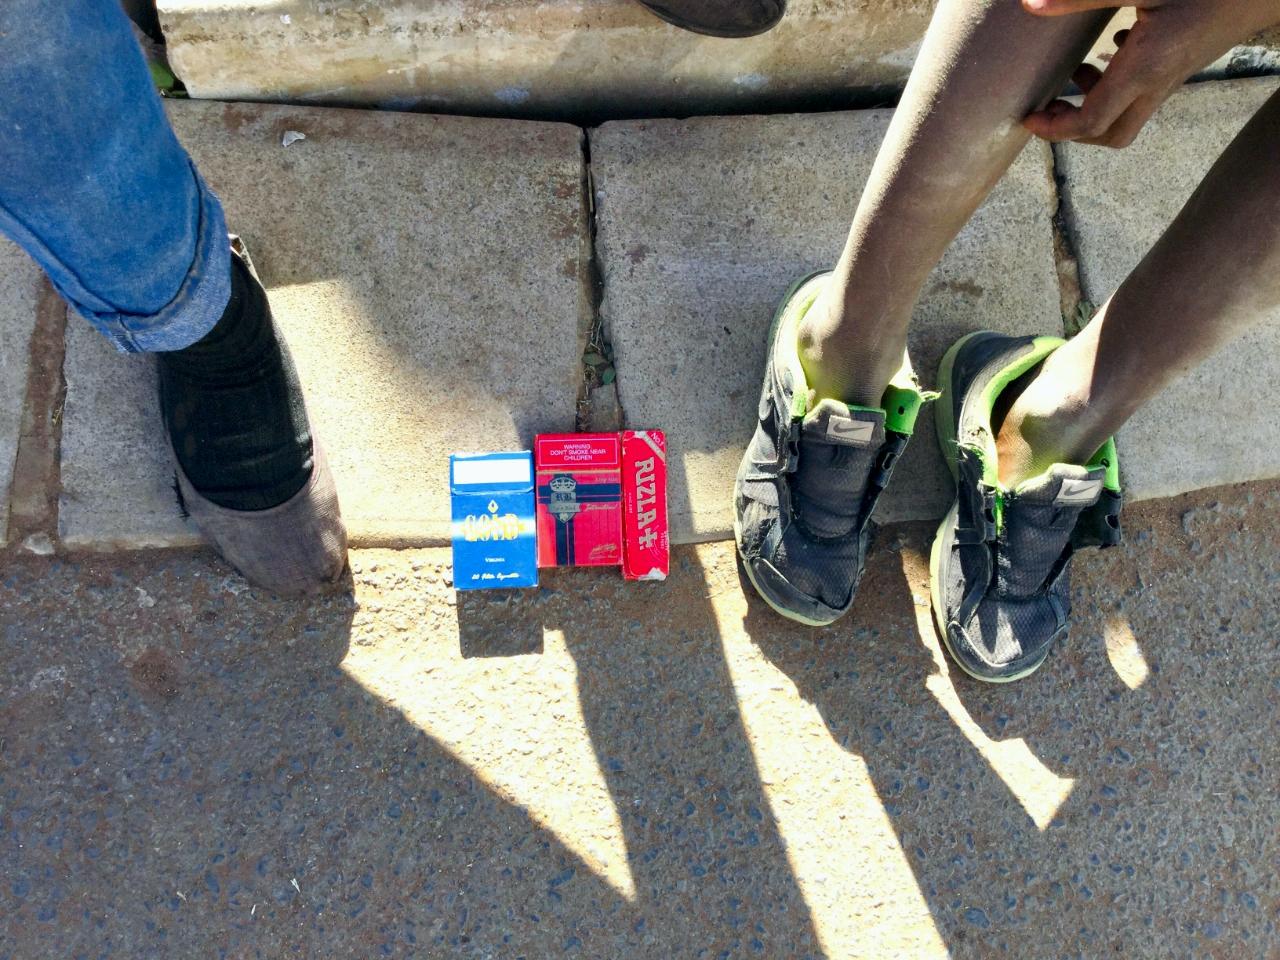 Schoolchildren sell cigarettes to help parents make ends meet - Daily Maverick